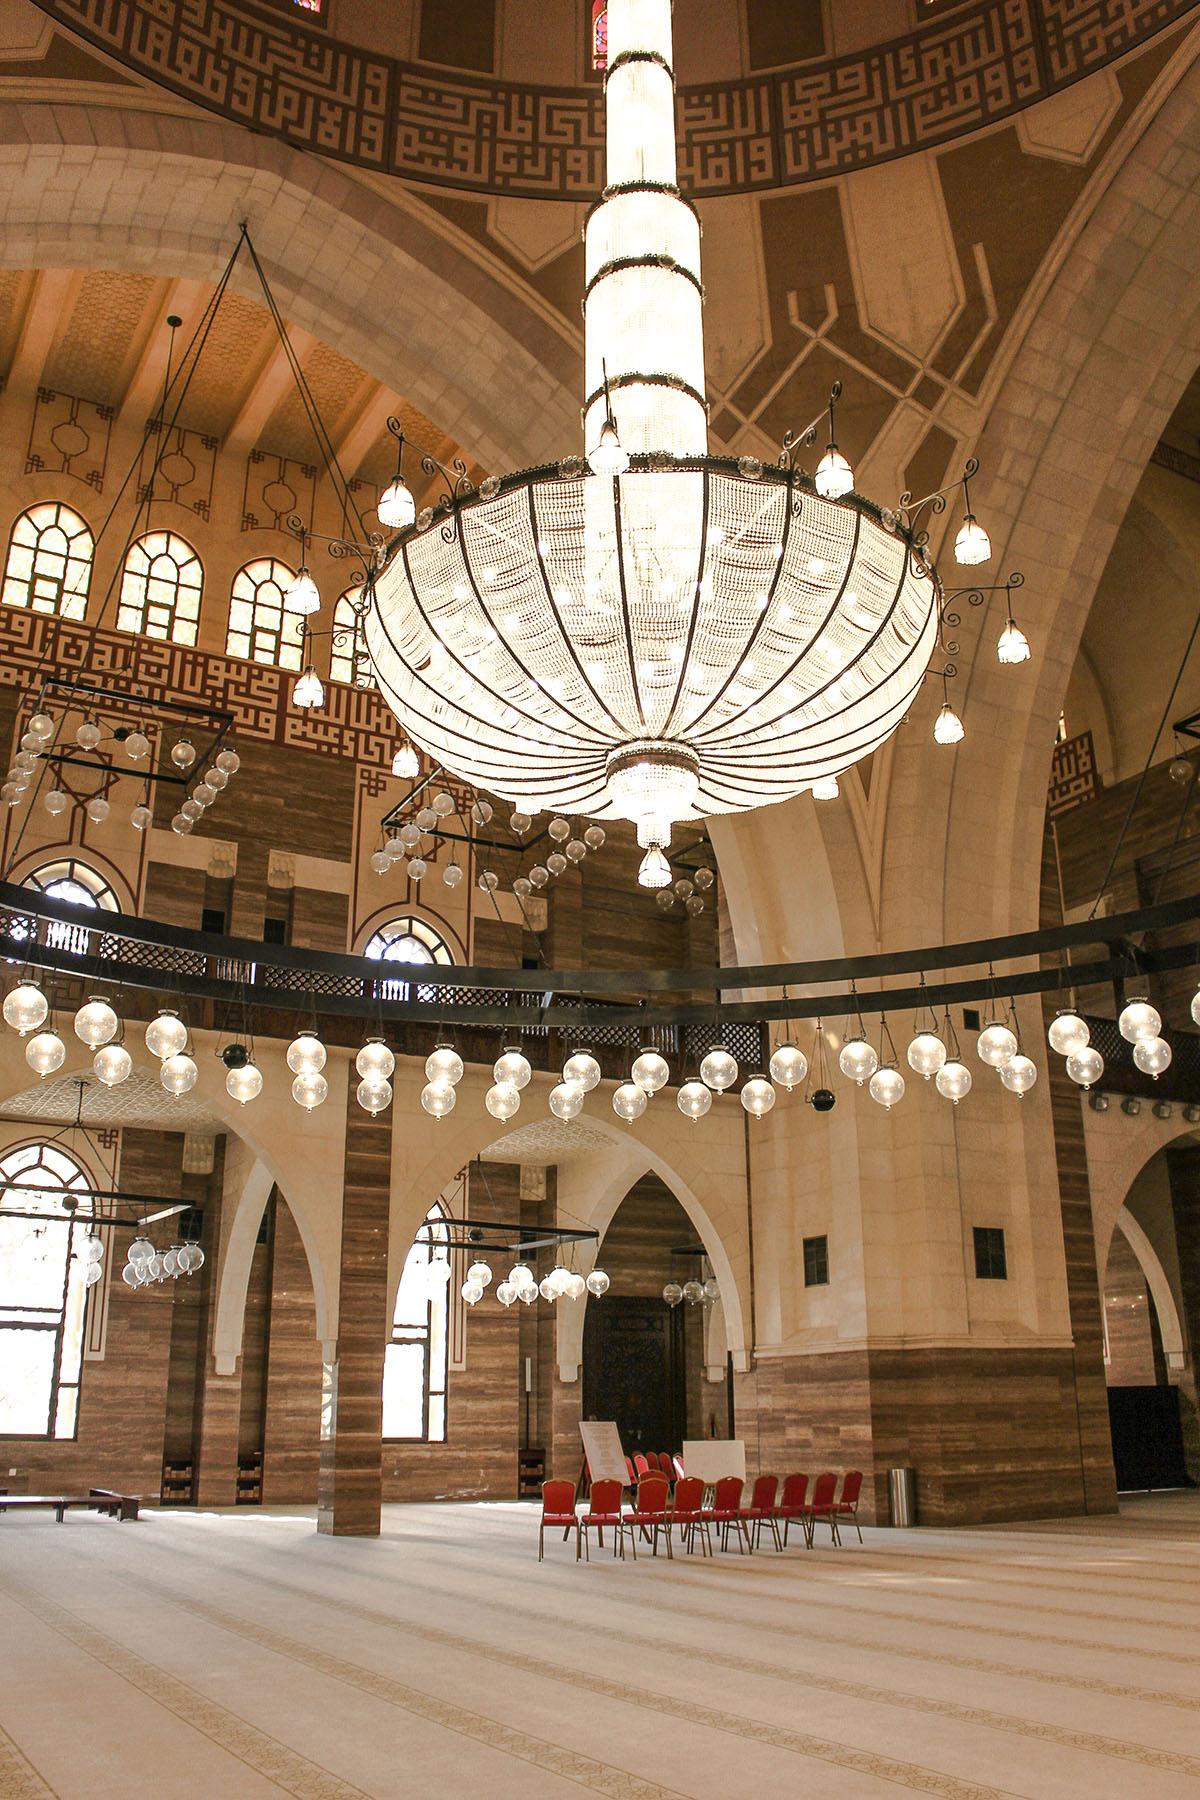 Orient Kreuzfahrt Manama Bahrain Ausflug Moschee 4